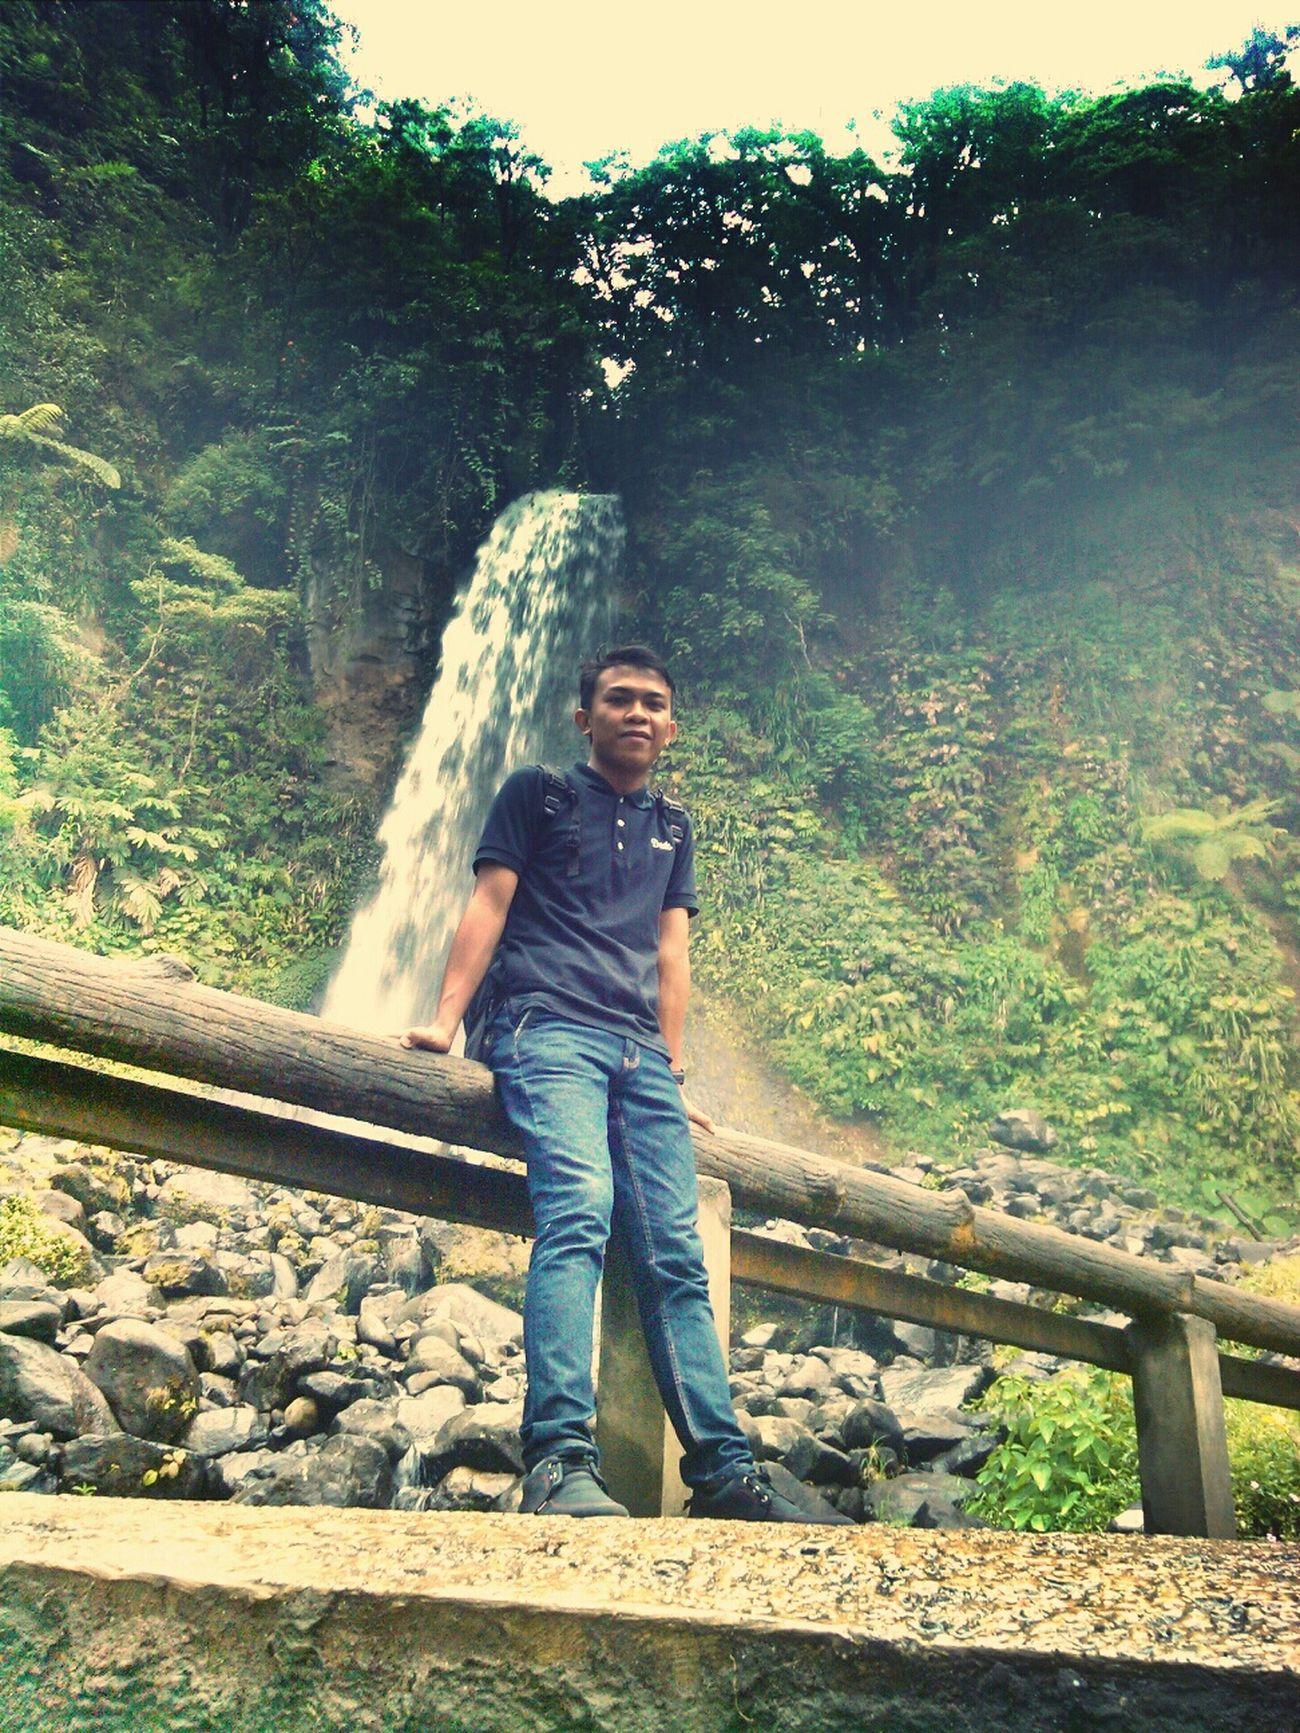 Good place